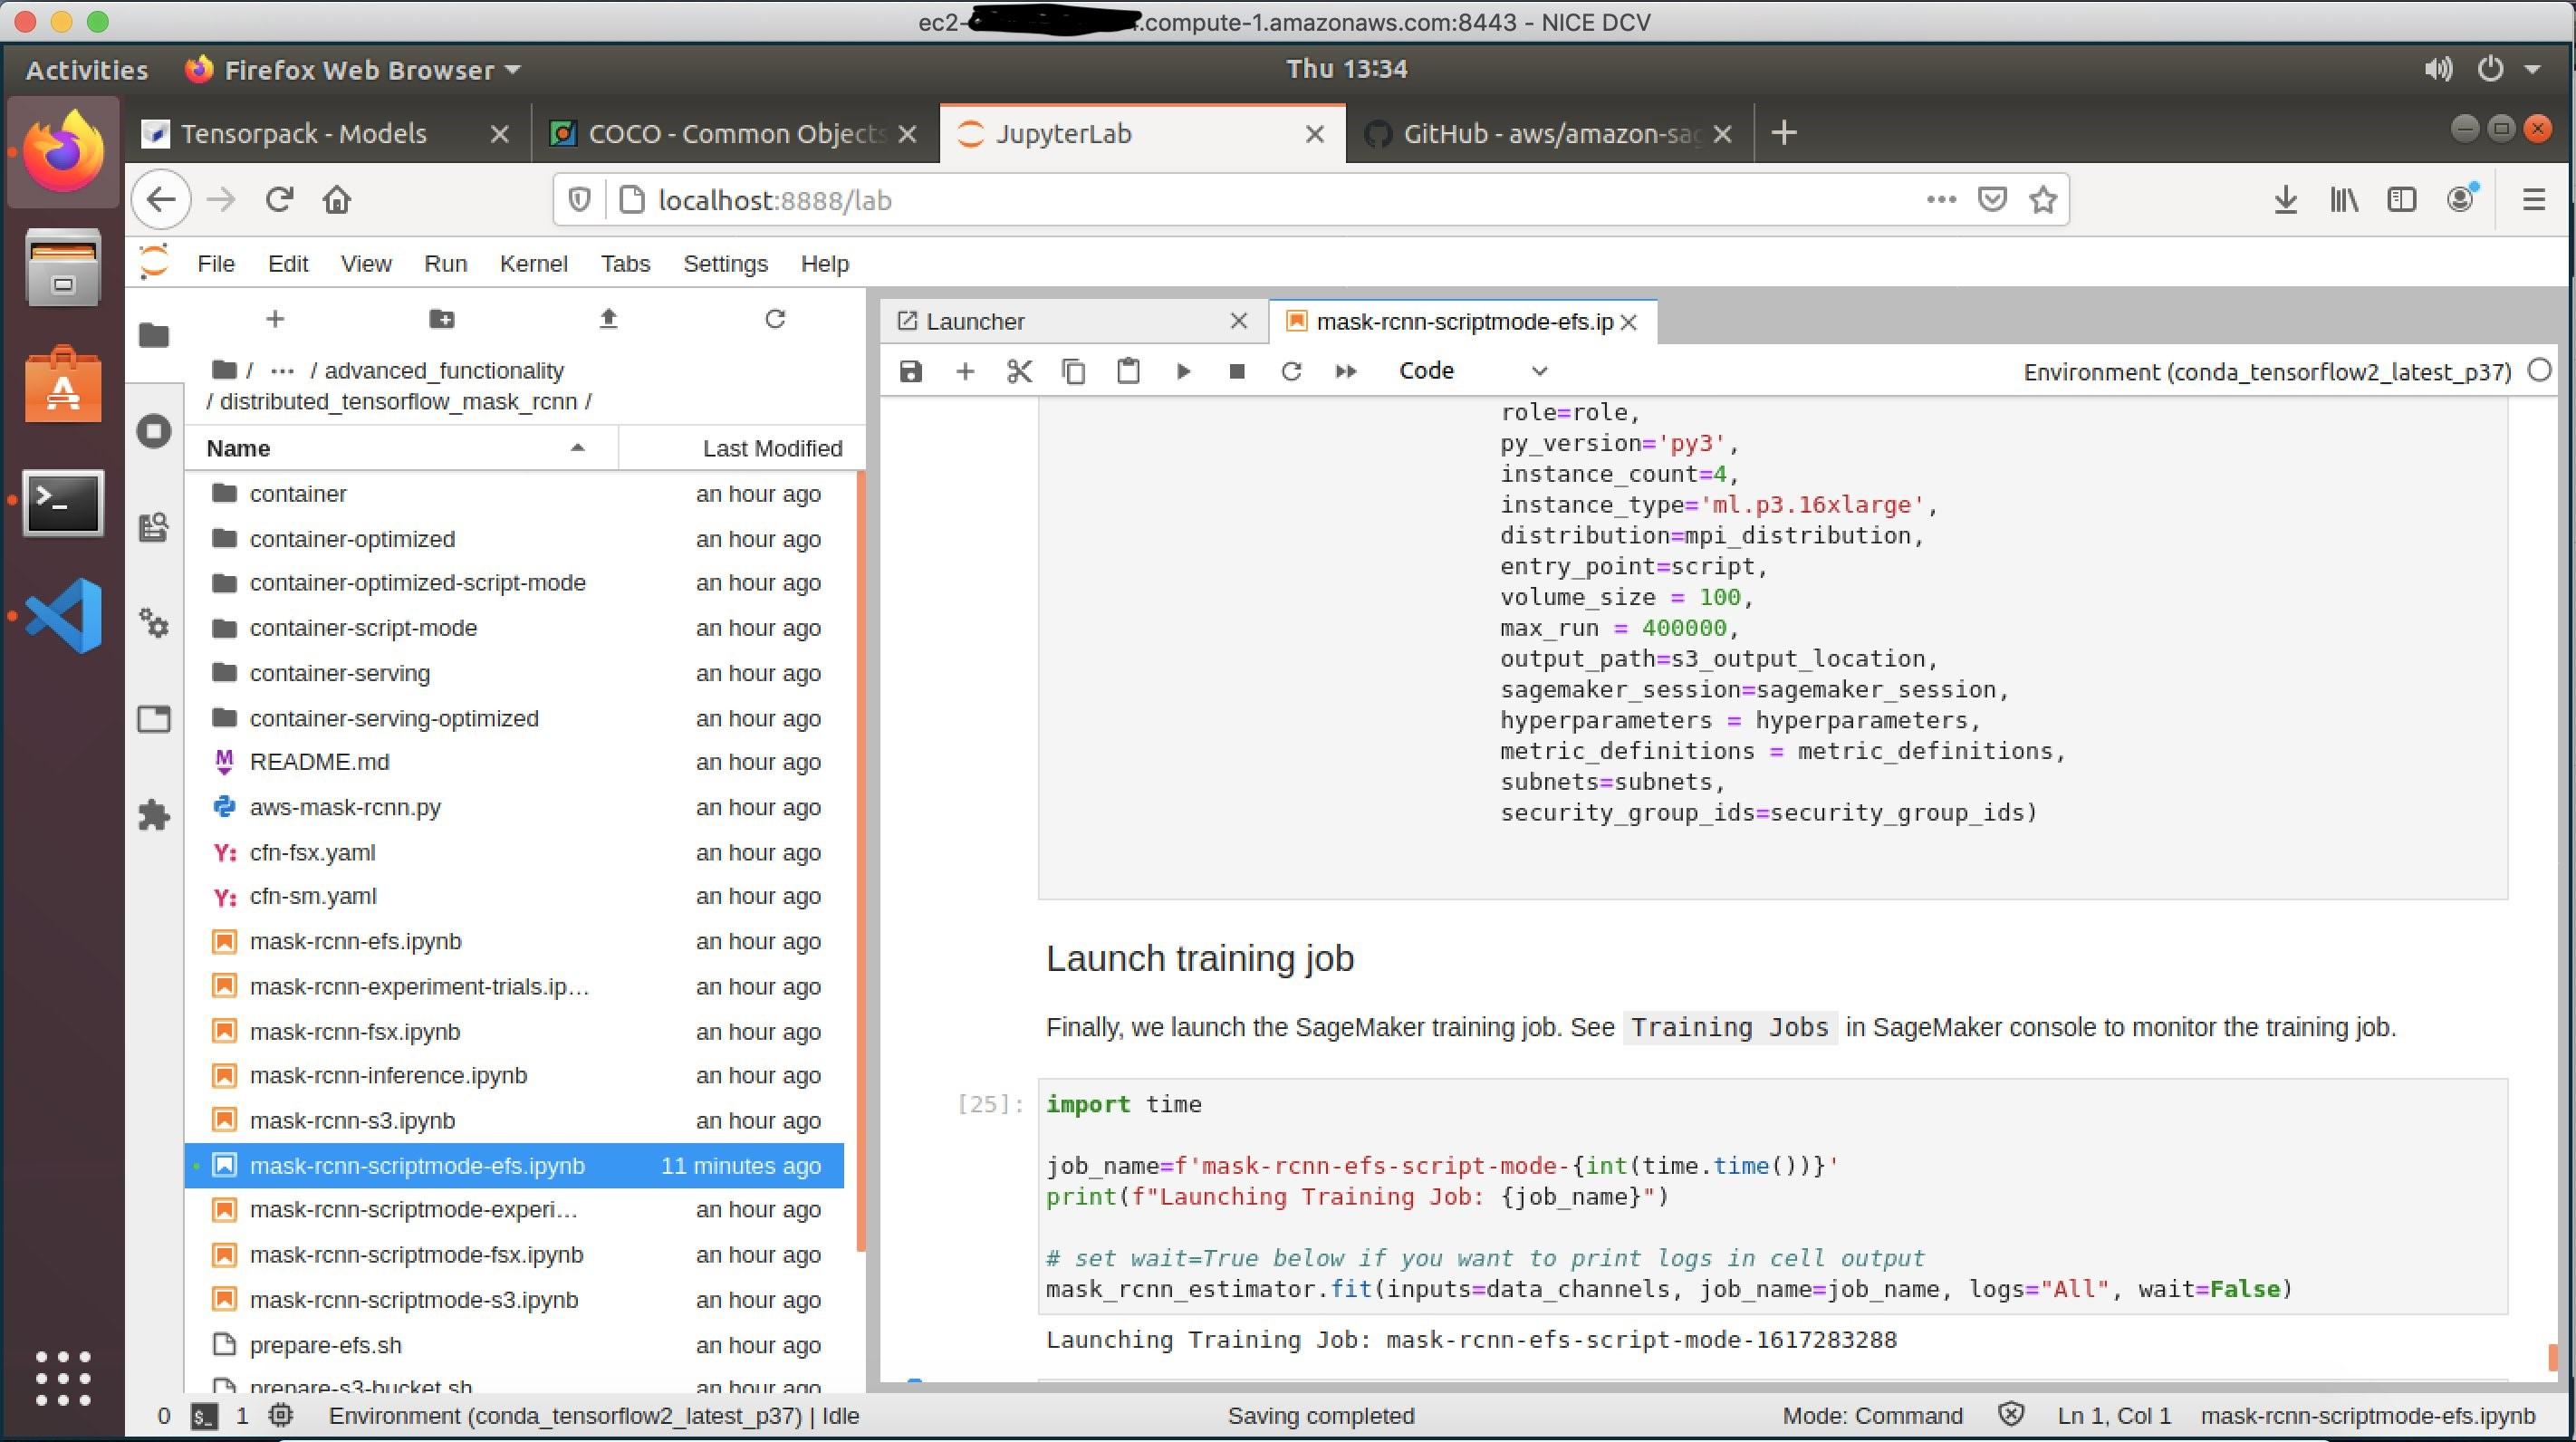 Submitting a SageMaker training job from deep learning desktop using Jupyter Lab notebook